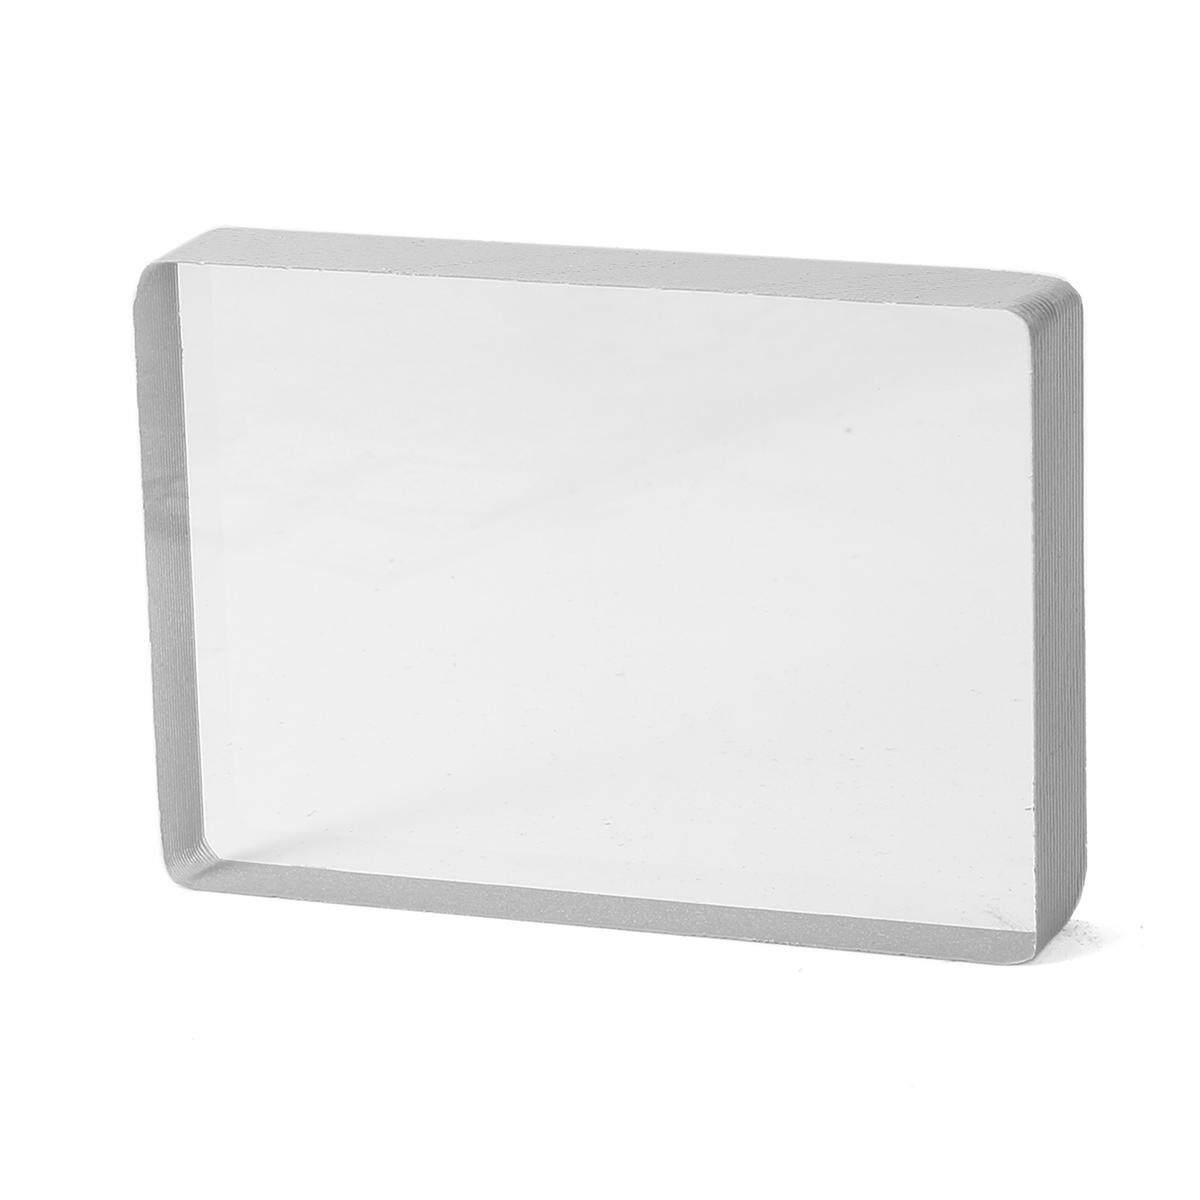 Omni Deck Glass Card Ice Bound MagicTricks Accessories Card Magic Close Up